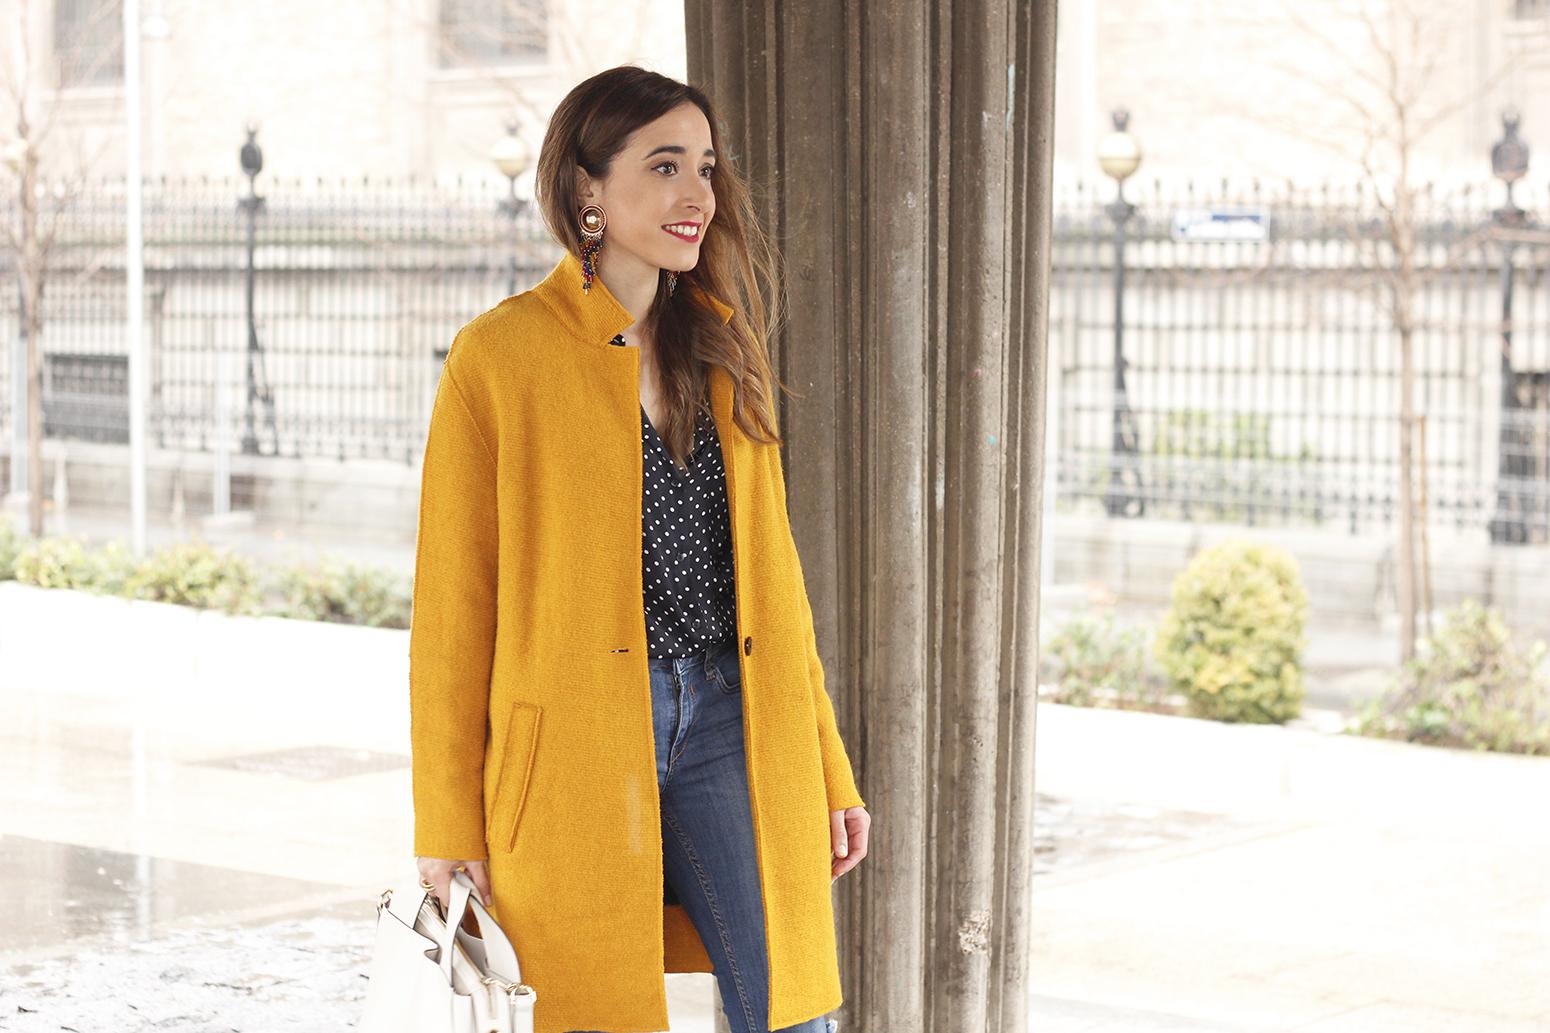 mustard coat polka dots shirt leopard heels white bag outfit 12